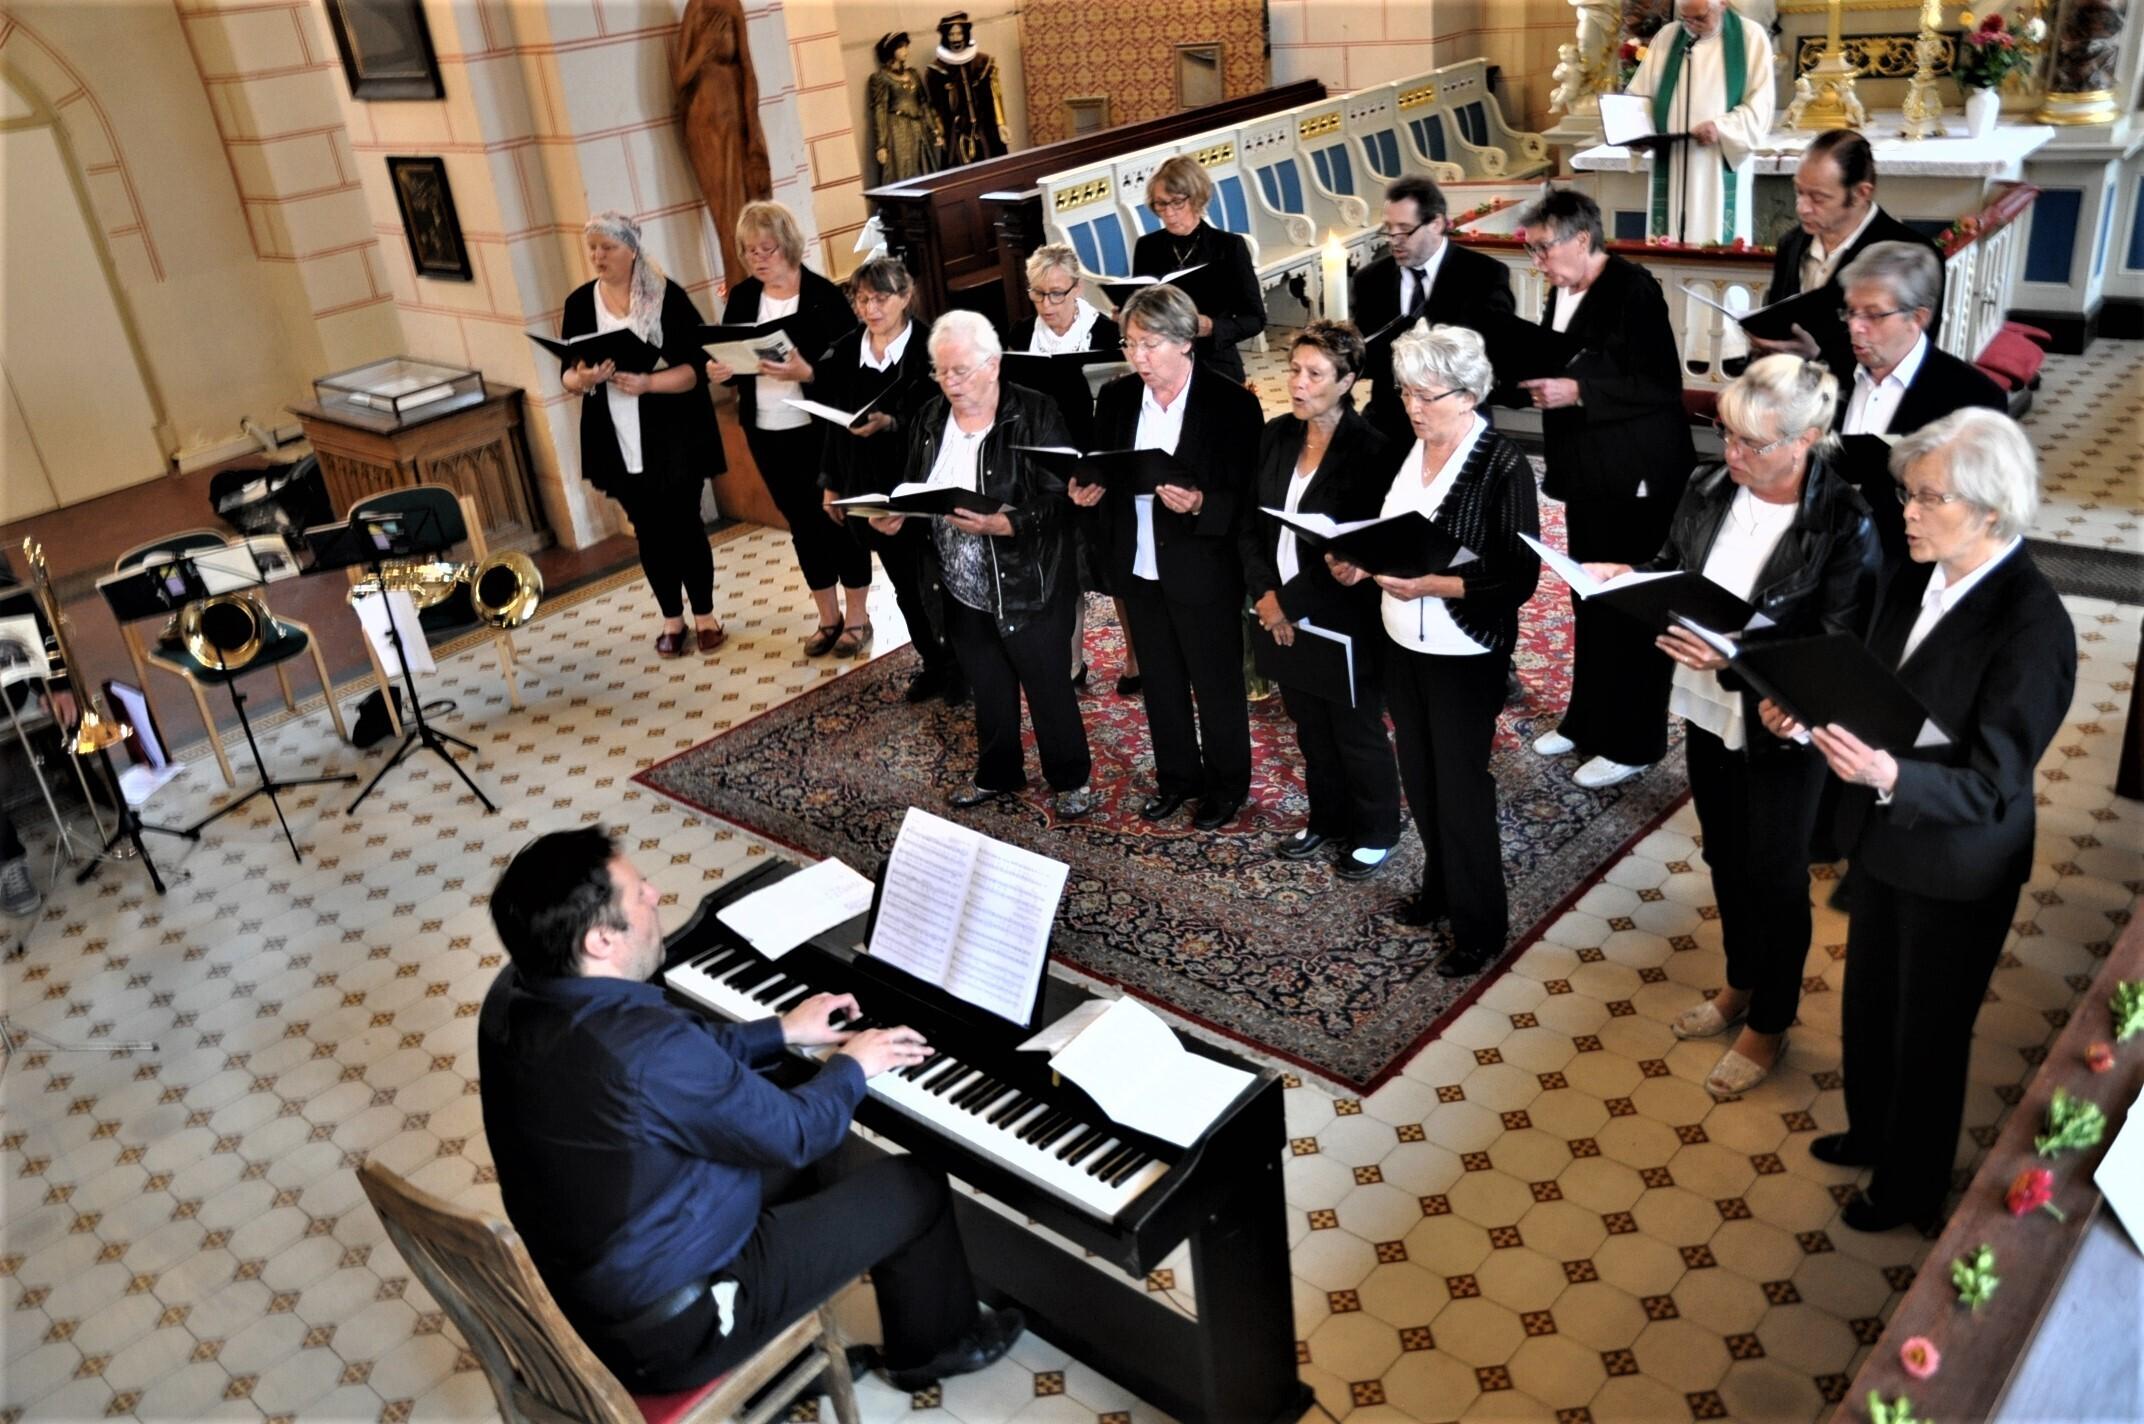 Kantor mit Chor